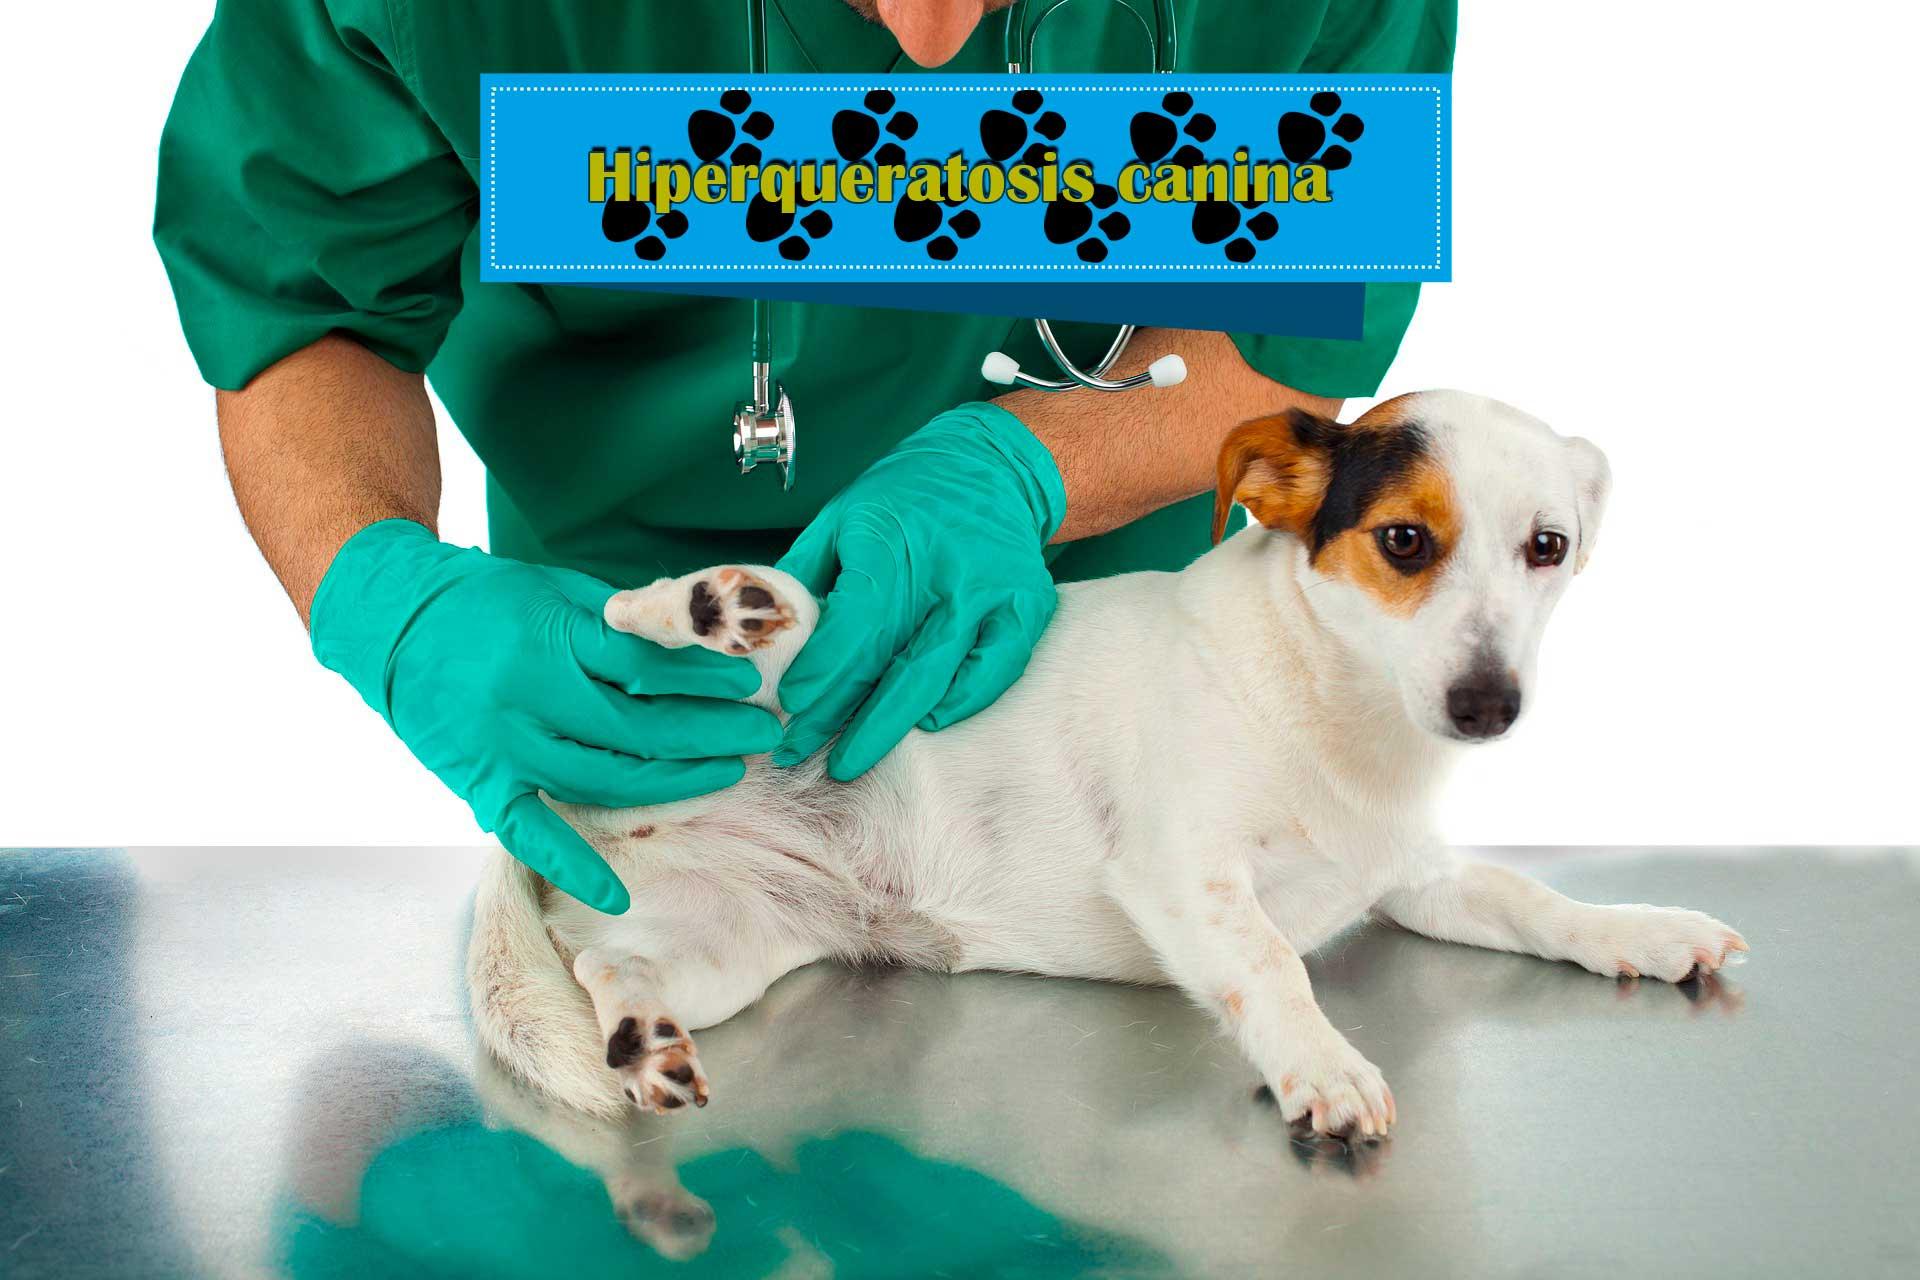 ¿Qué es la hiperqueratosis canina?